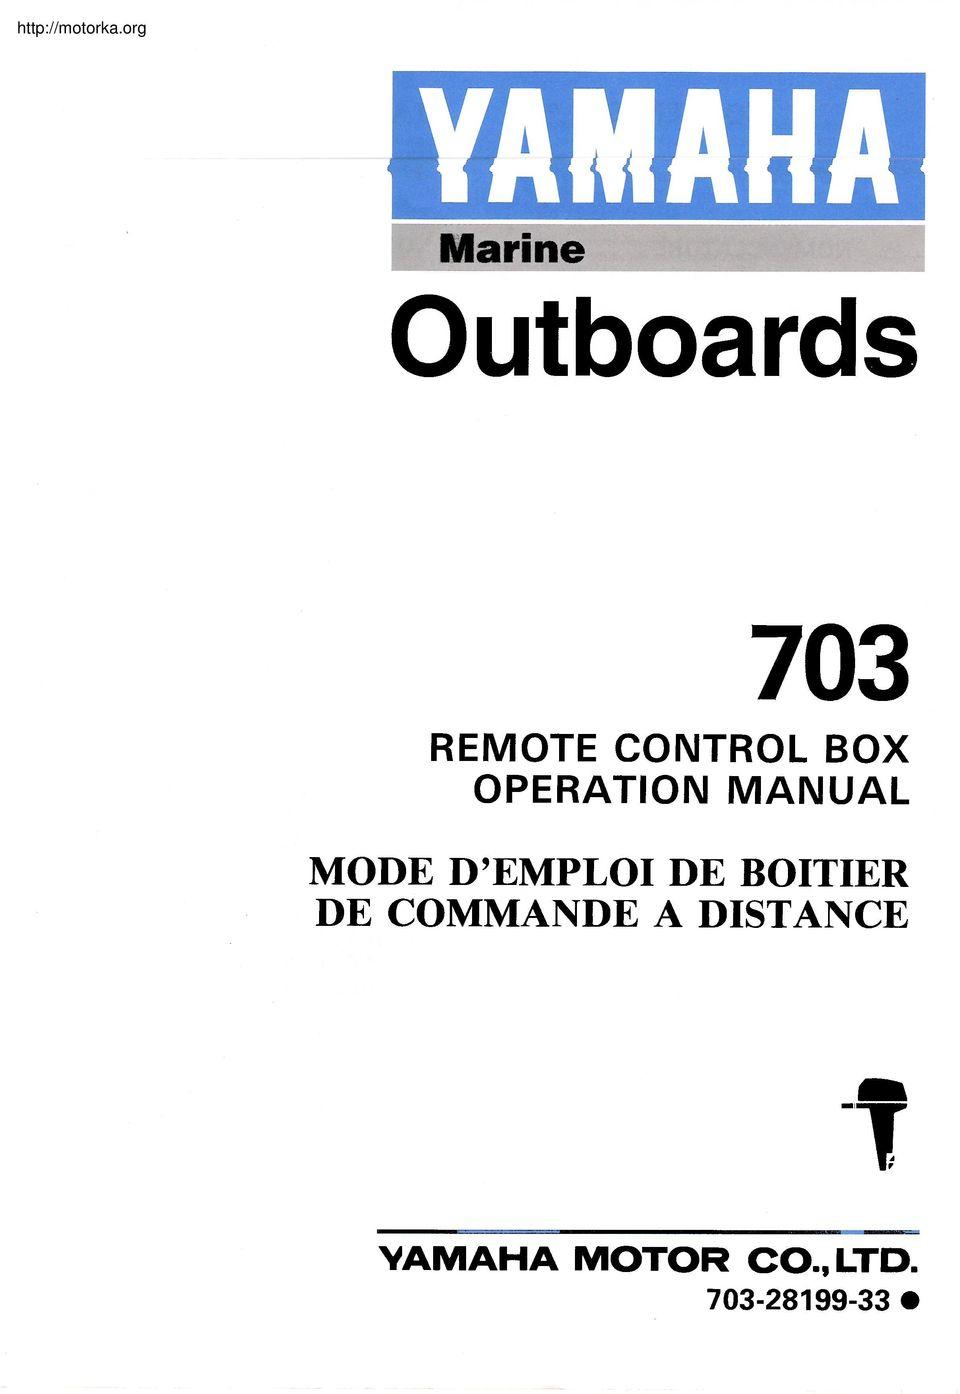 Mode D'emploi De Boitier De Commande A Distance. Marine Outboards - Yamaha 703 Remote Control Wiring Diagram